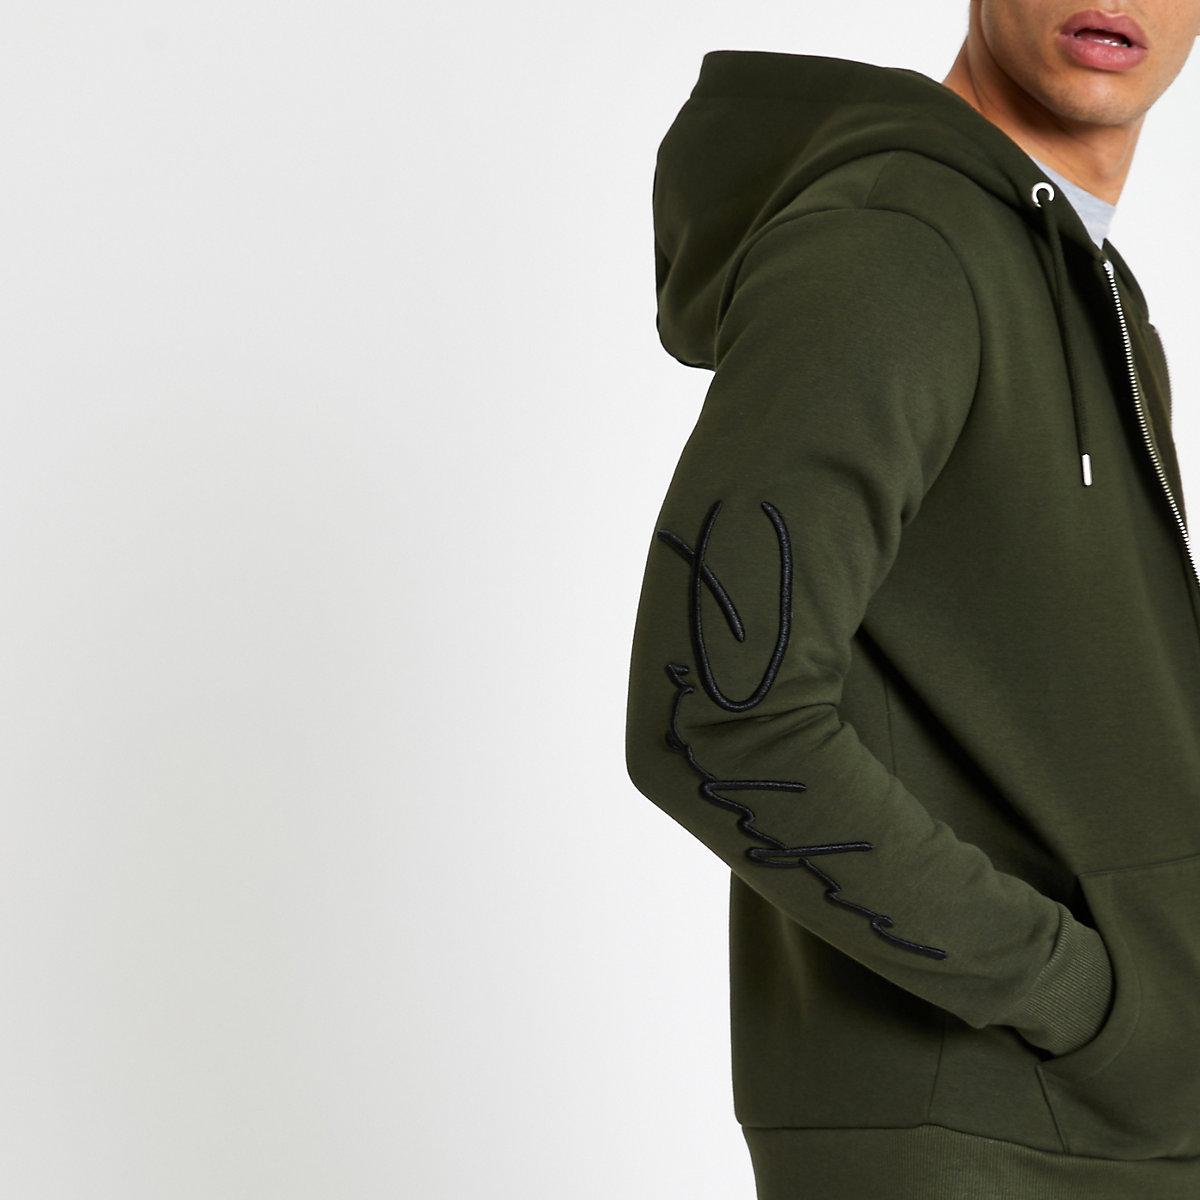 Khaki slim fit 'Prolific' zip front hoodie